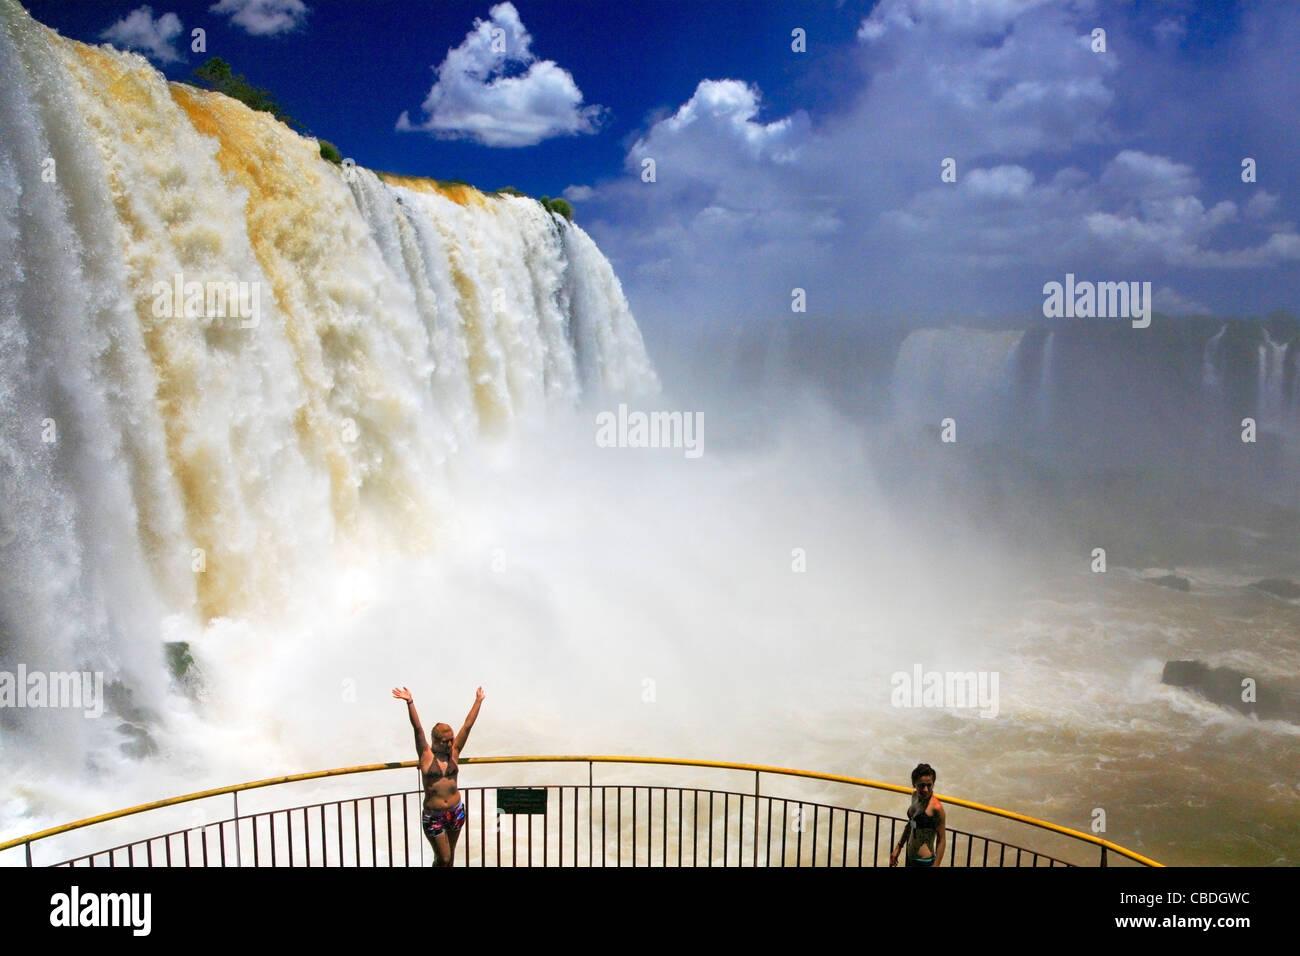 Iguazu falls, along Iguazu river. Placed in the border of Argentina, and Brasil. This is Brasilian side. - Stock Image